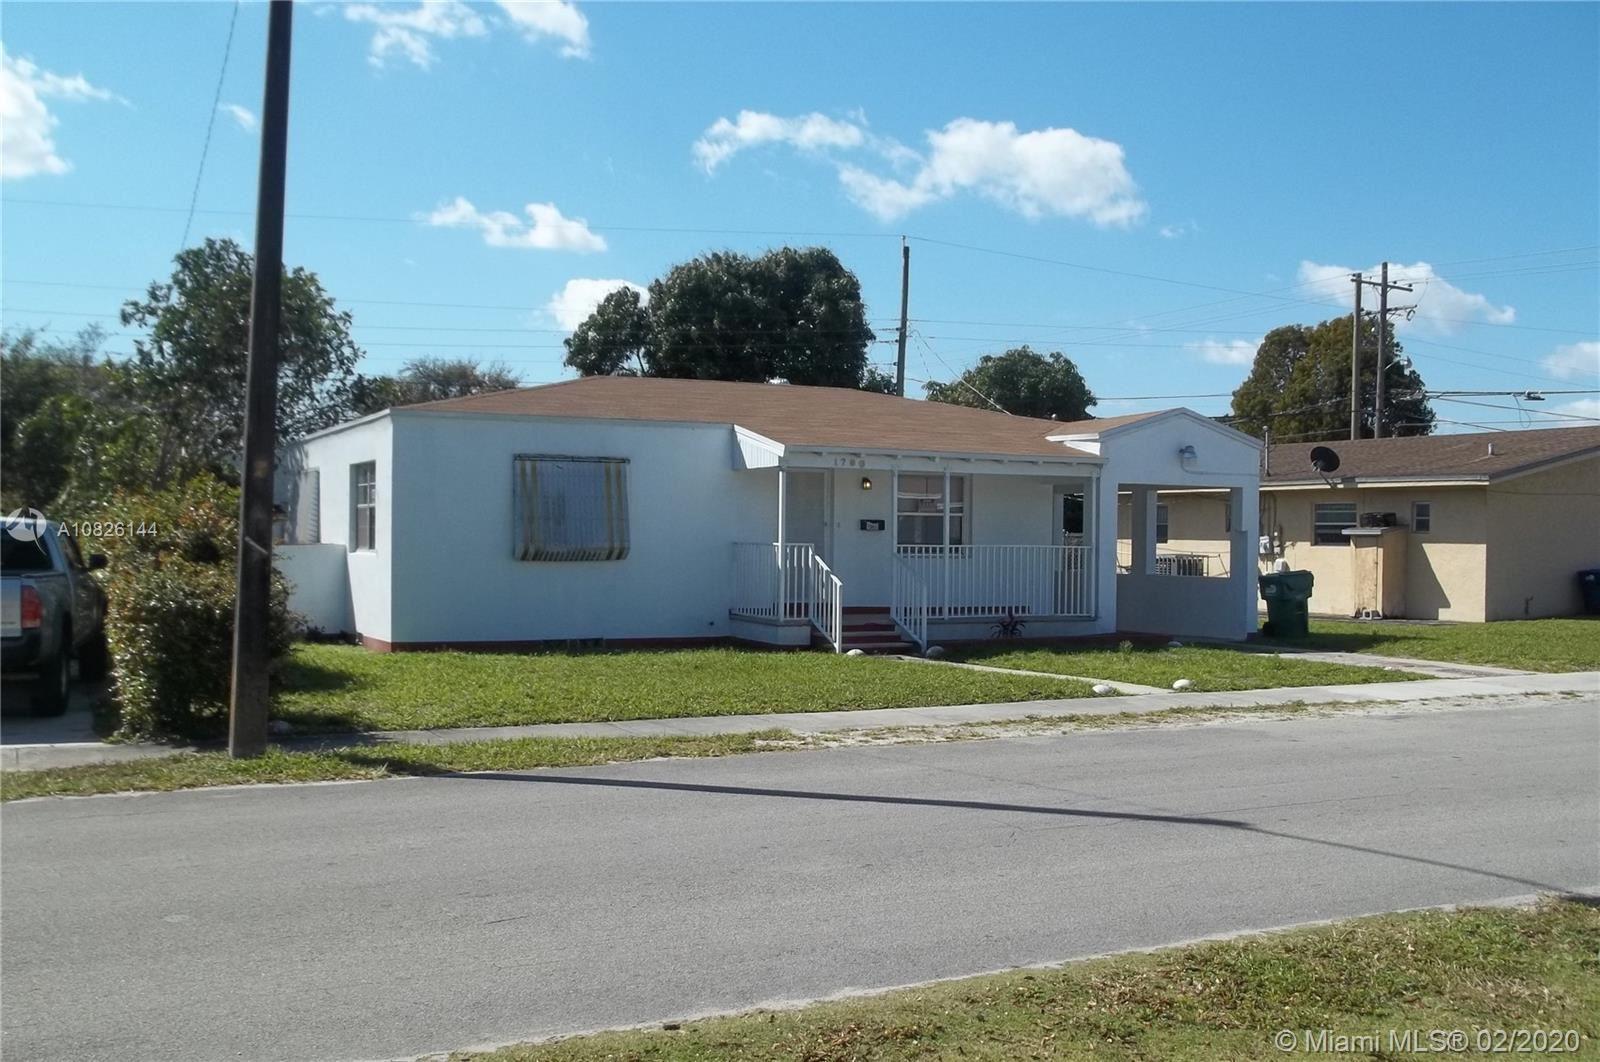 1790 NW 83rd St, Miami, FL 33147 - #: A10826144